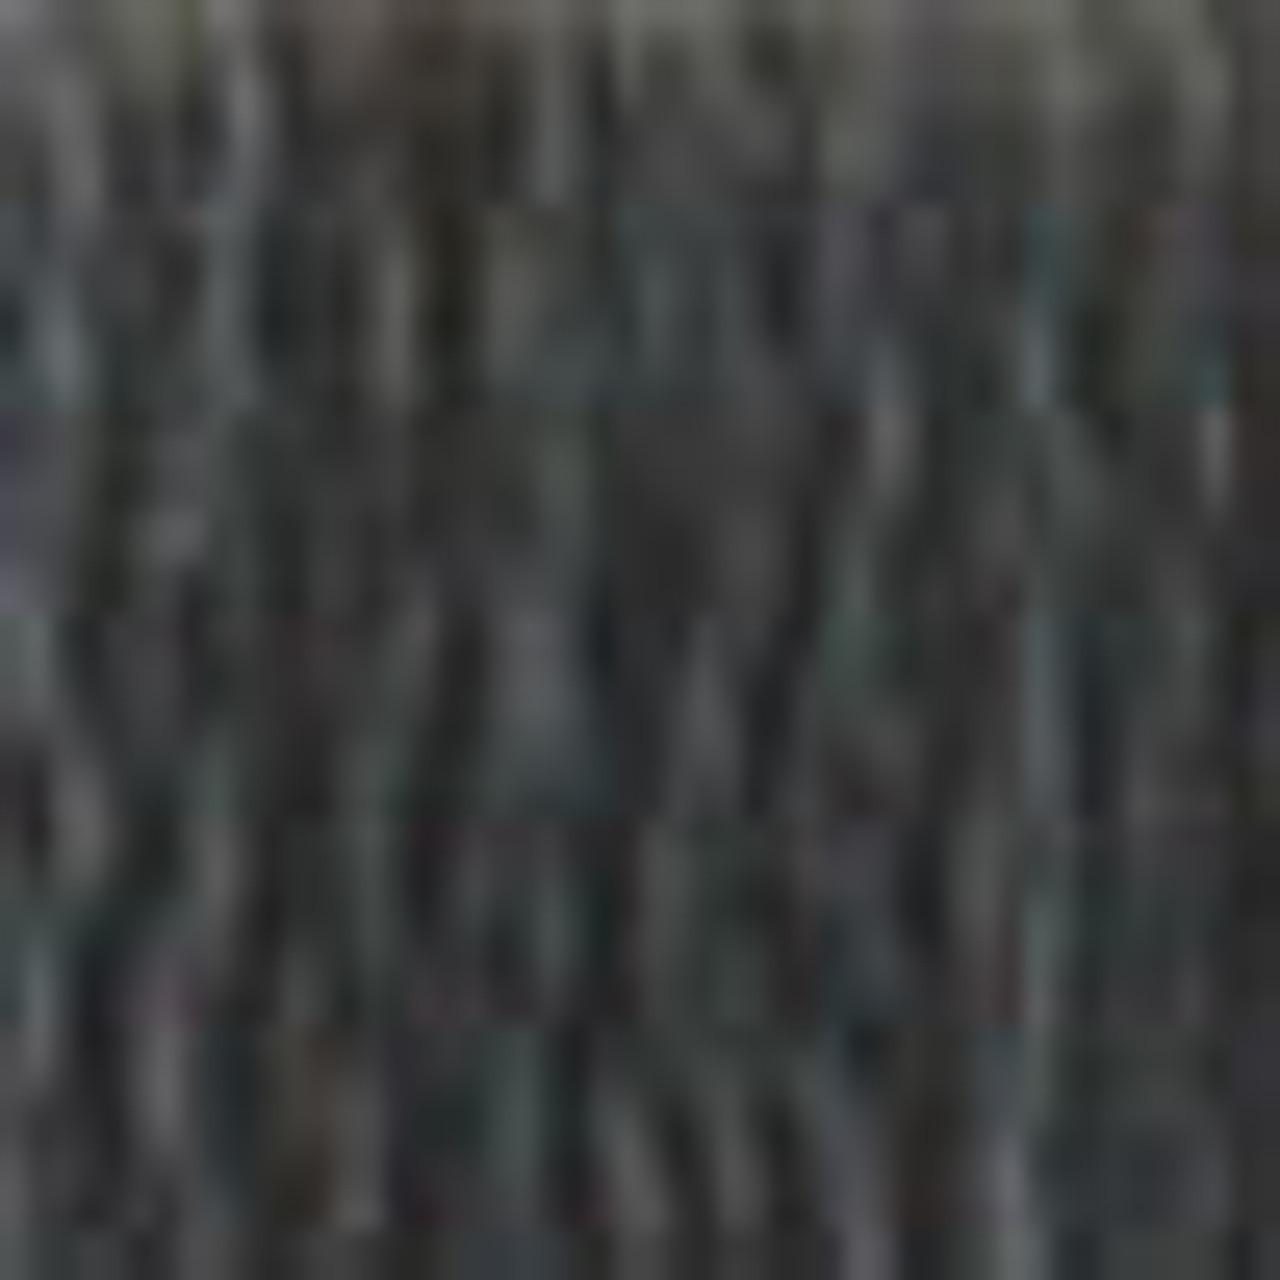 DMC # 3799 Very Dark Pewter Gray Floss / Thread